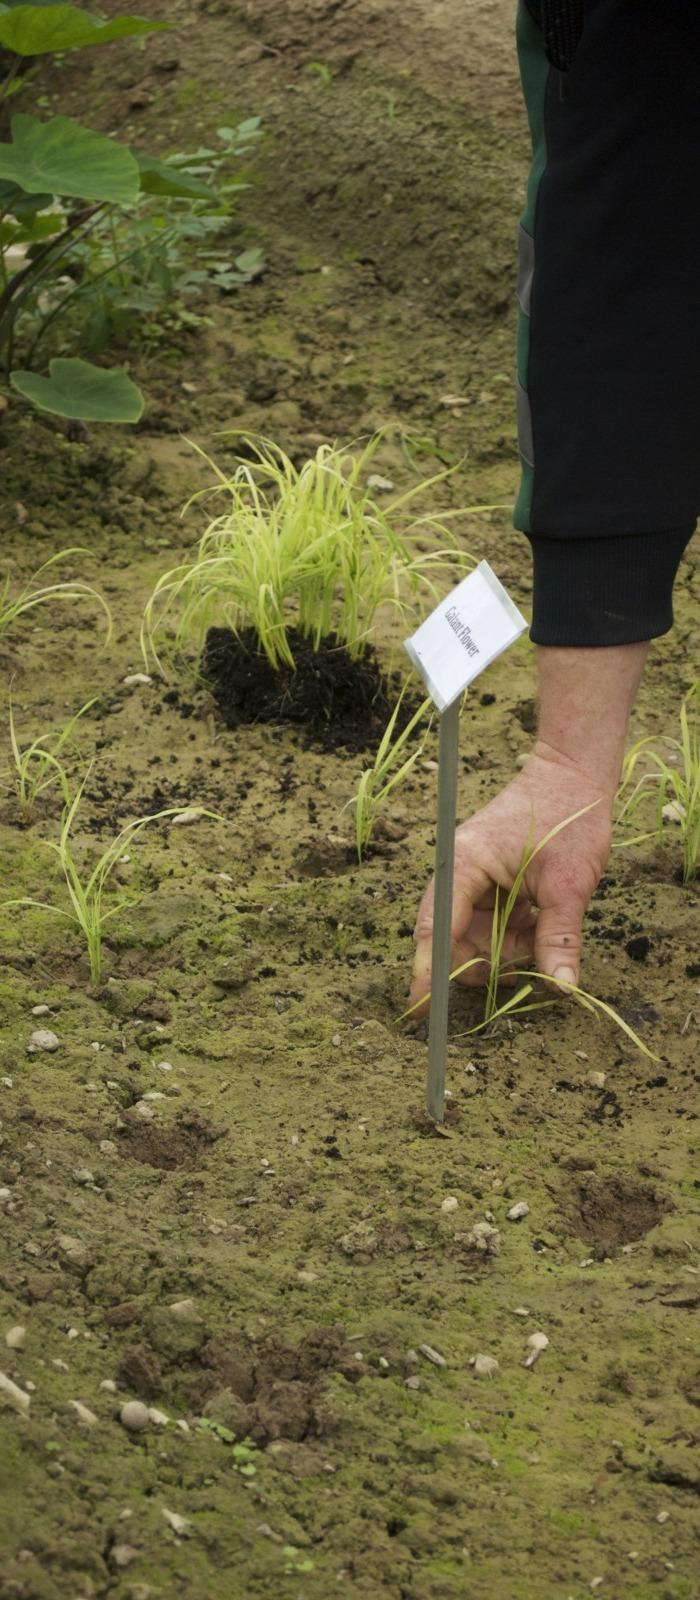 Tropenhaus: Reis anpflanzen